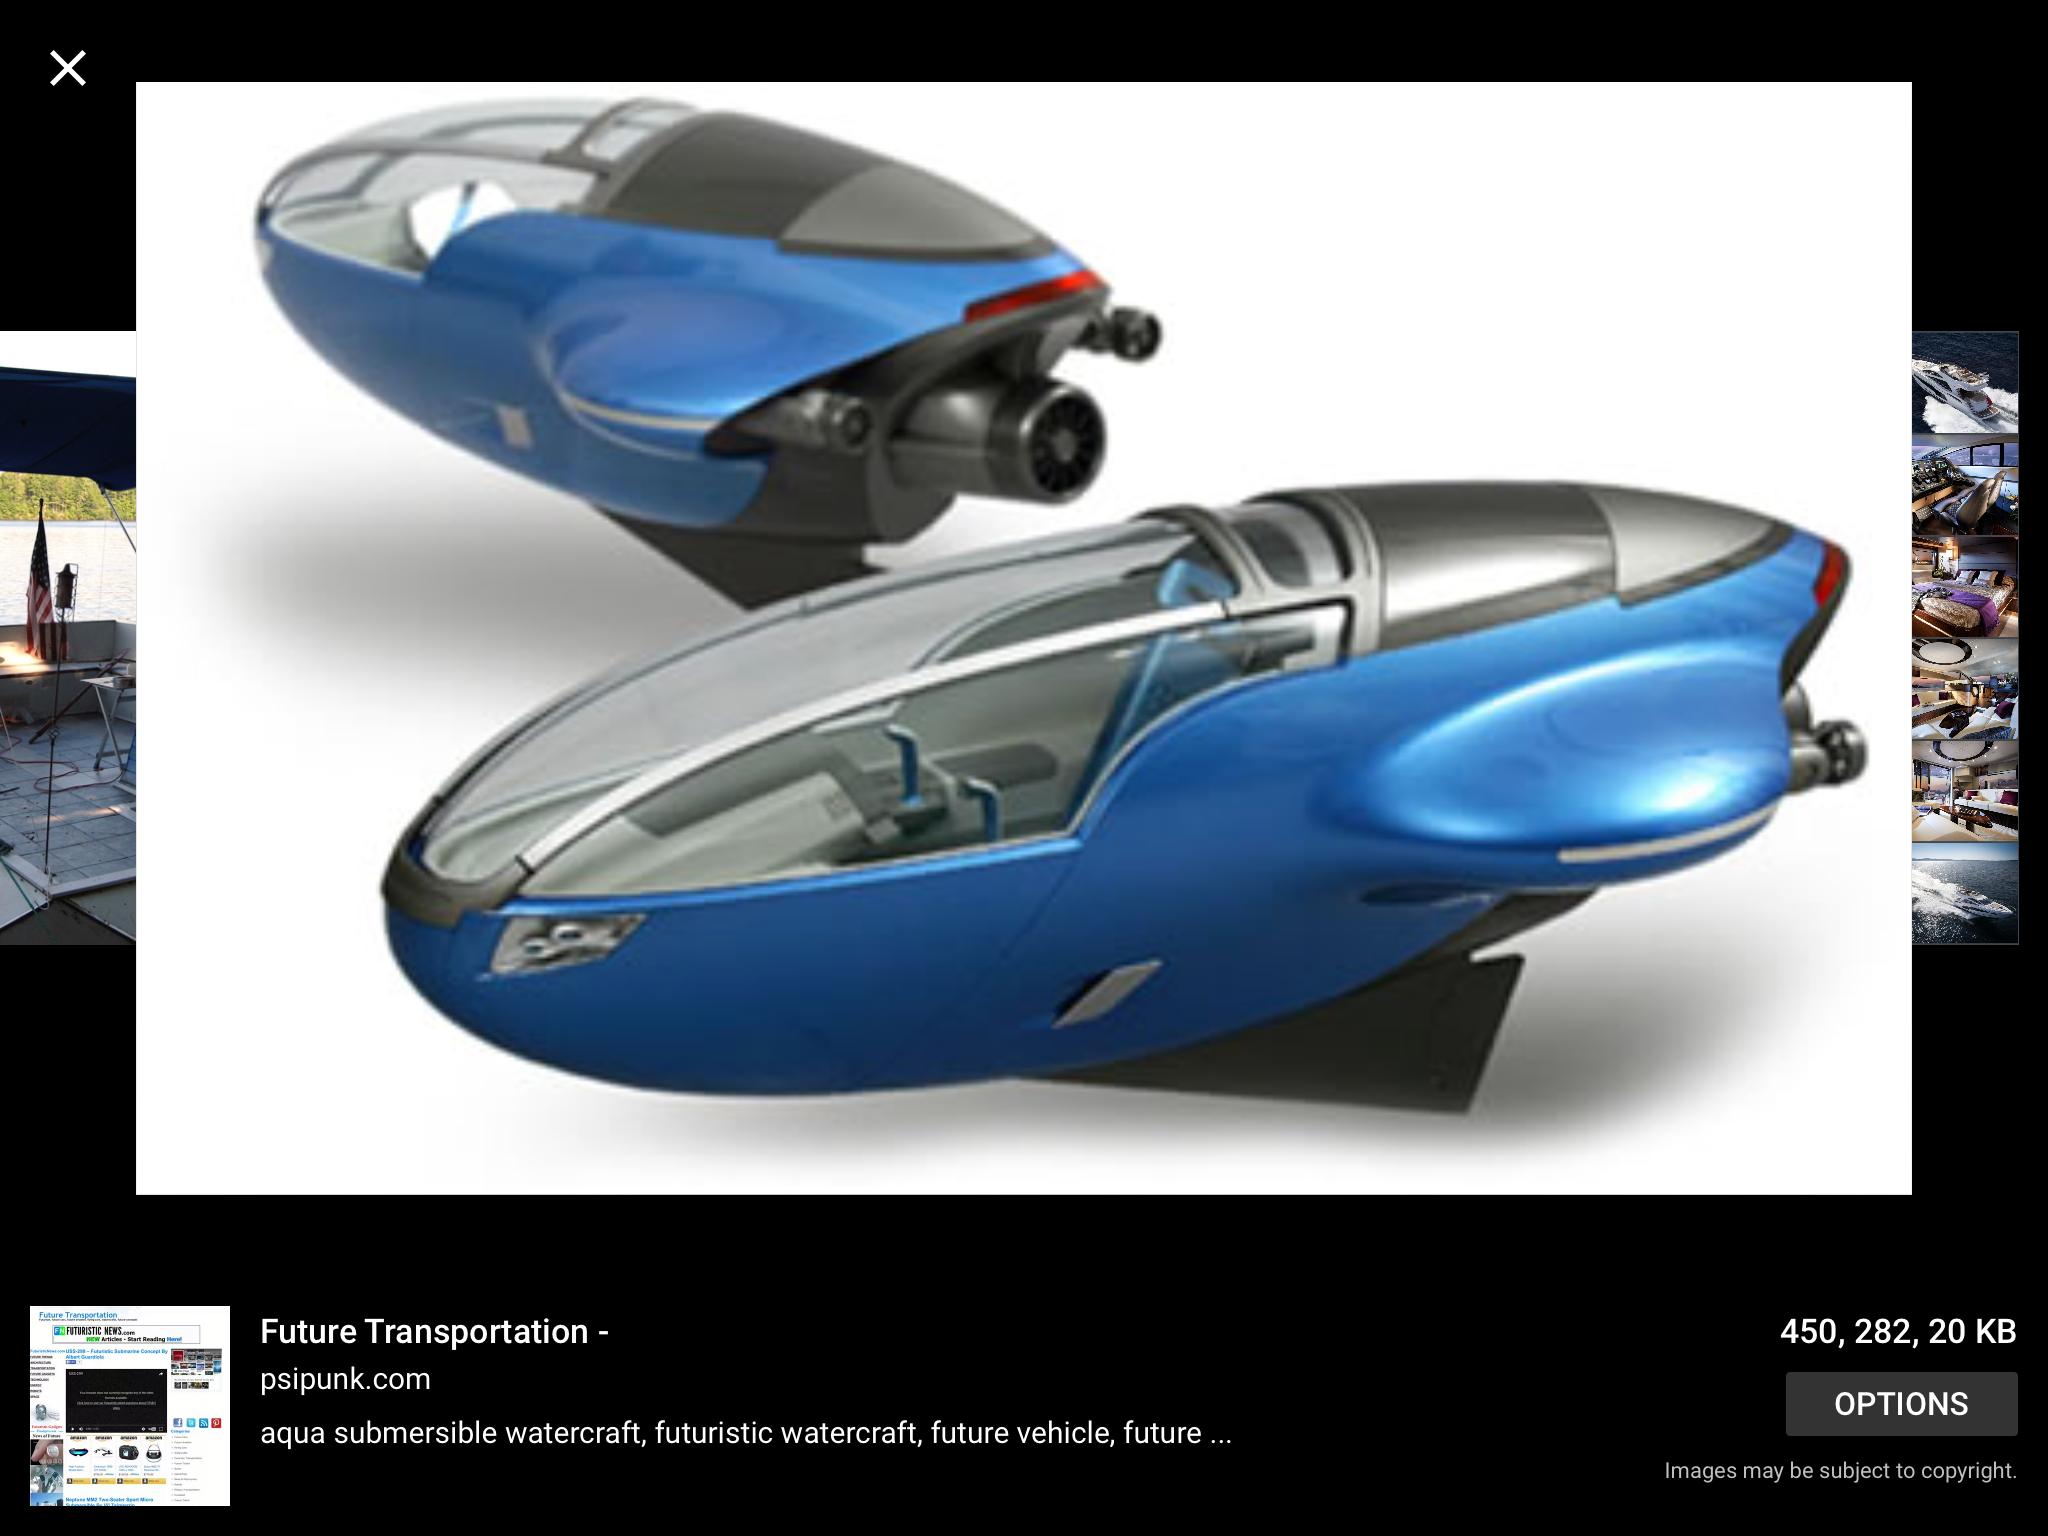 Recreational submarine | Submarine | Water crafts, Boat, Futuristic cars